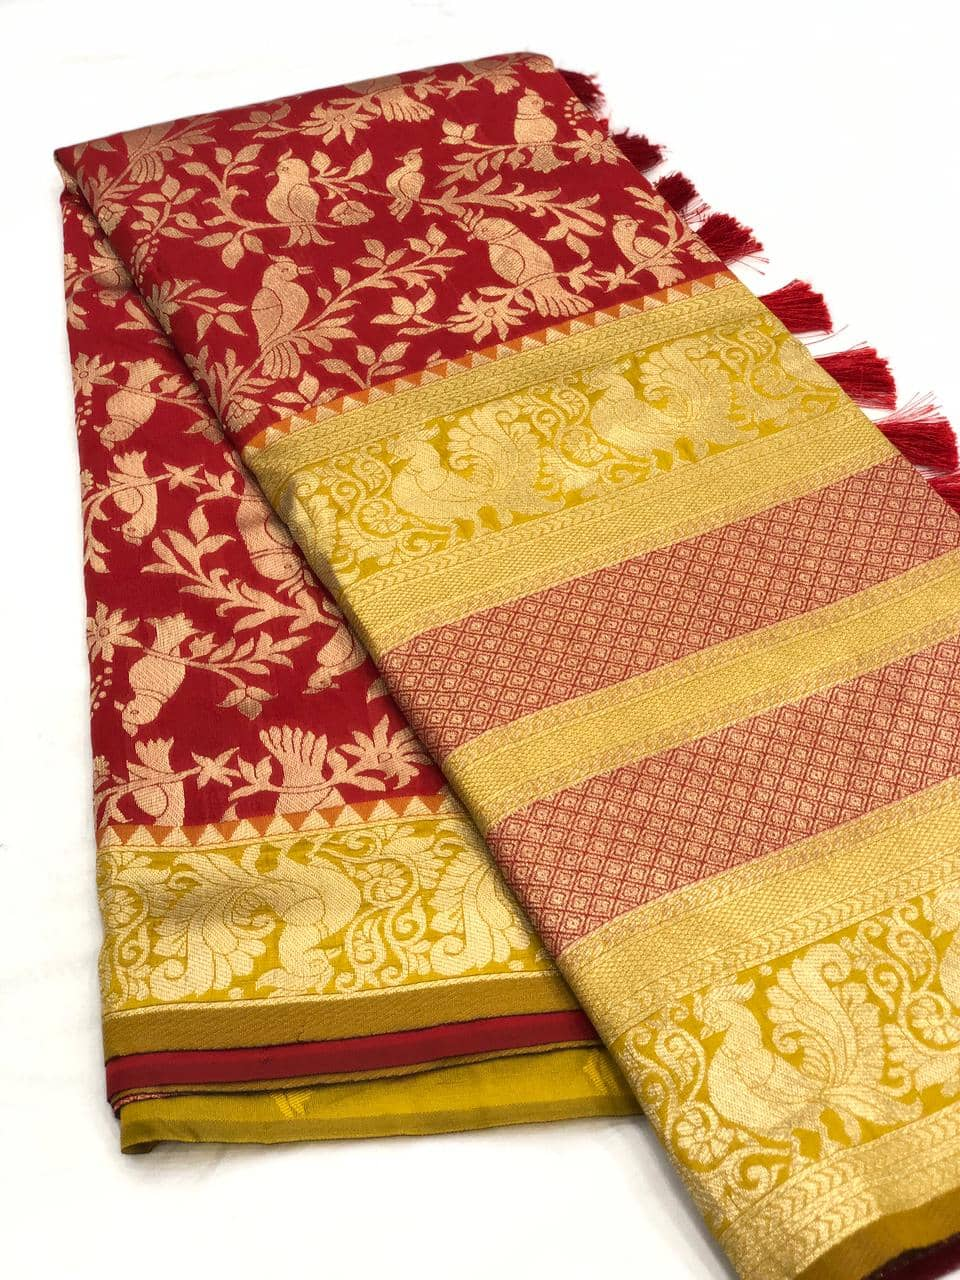 Stunning Kanchipuram Silk Traditional Saree in Maroon dvz0001764